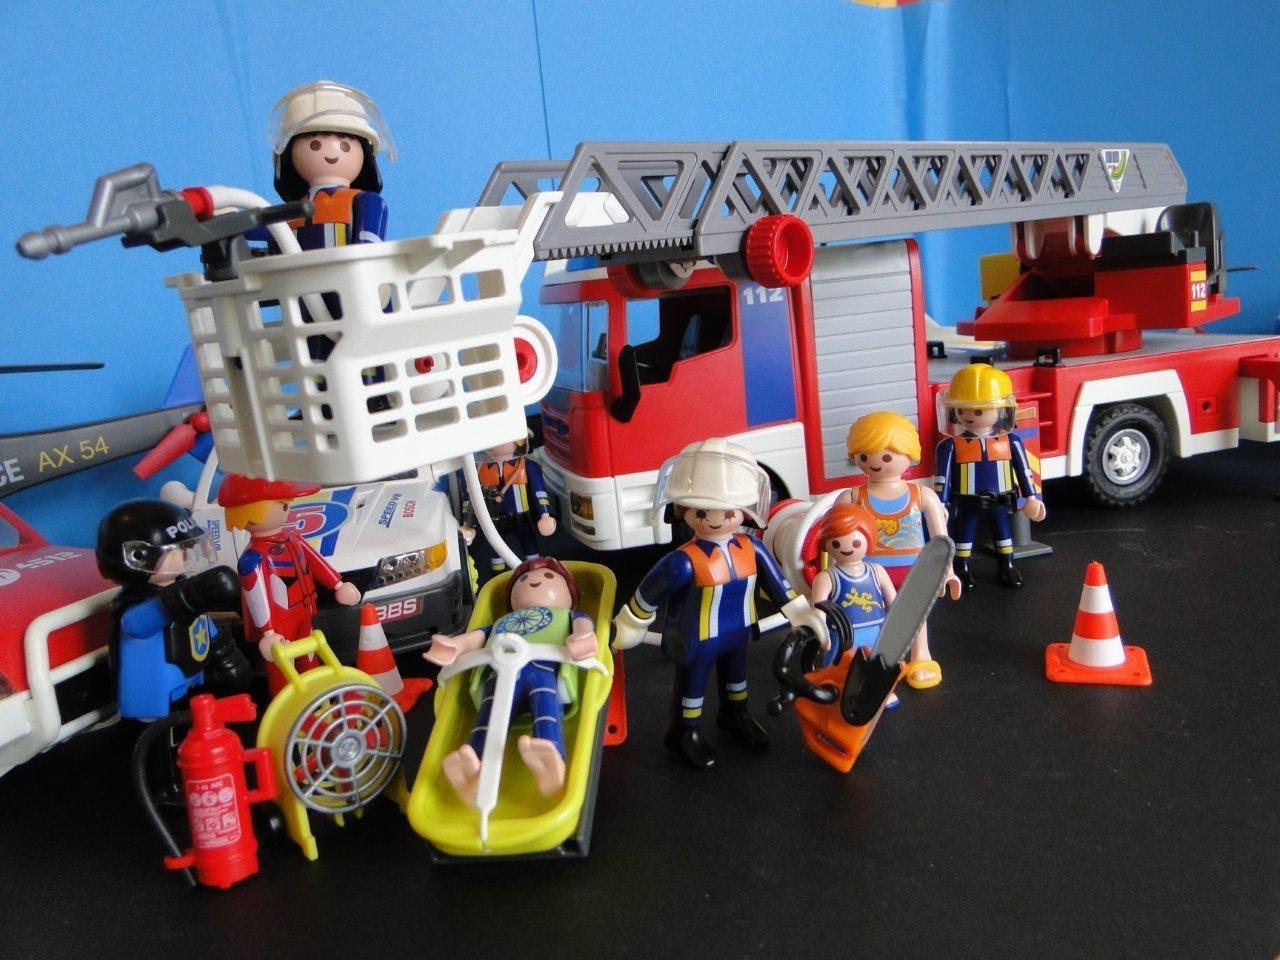 Playmobil Playmobil Pompier Voiture Voiture Pompier Voiture Pompier Voiture Pompier Playmobil Playmobil Voiture Pompier Playmobil lT3F1KJc